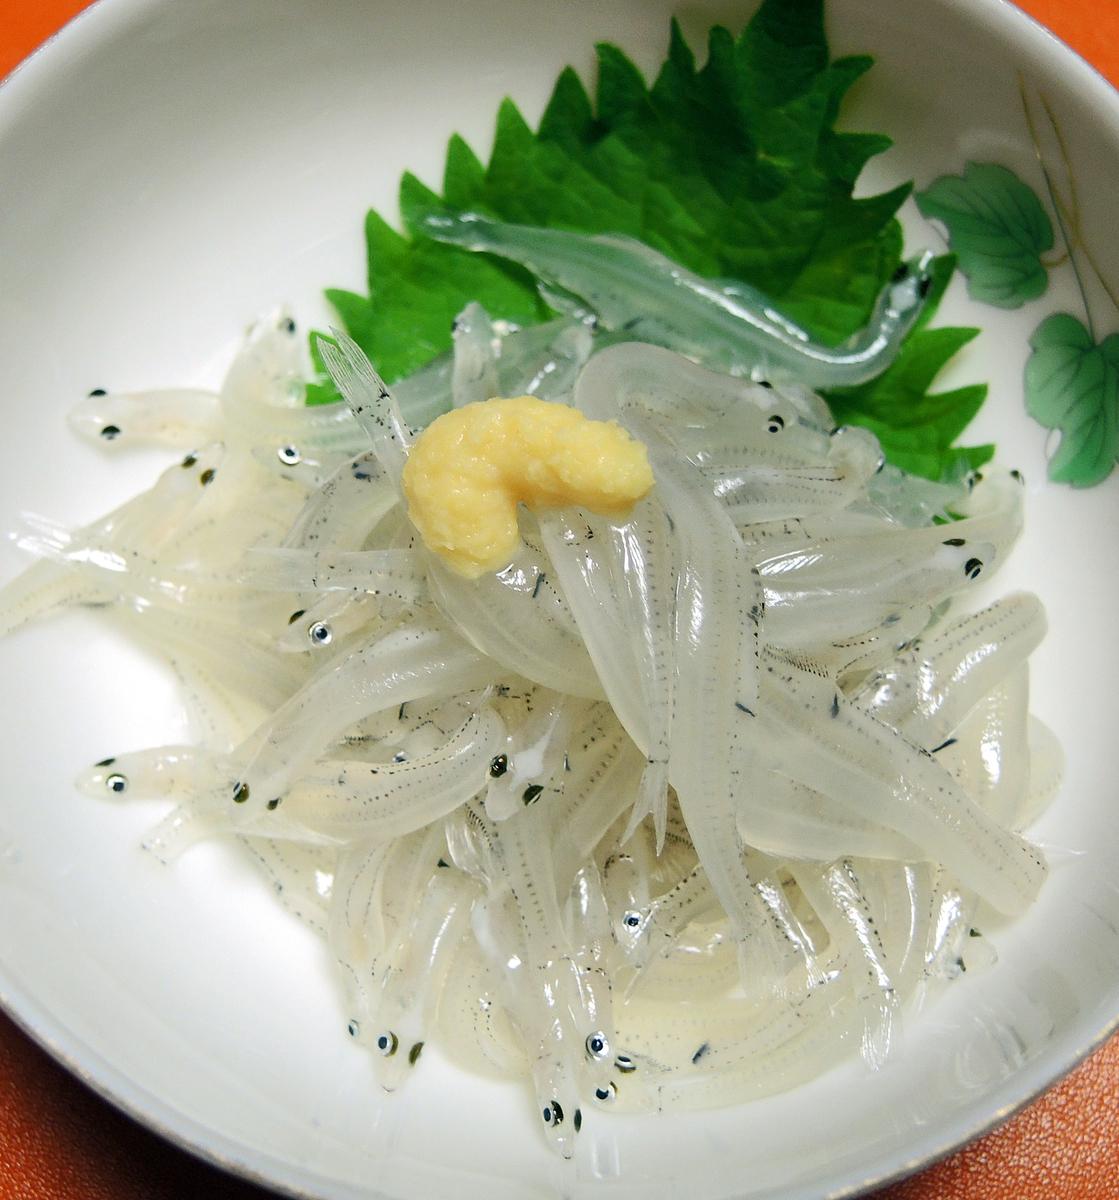 f:id:sashimi-fish1:20210311162931j:image:w150:left